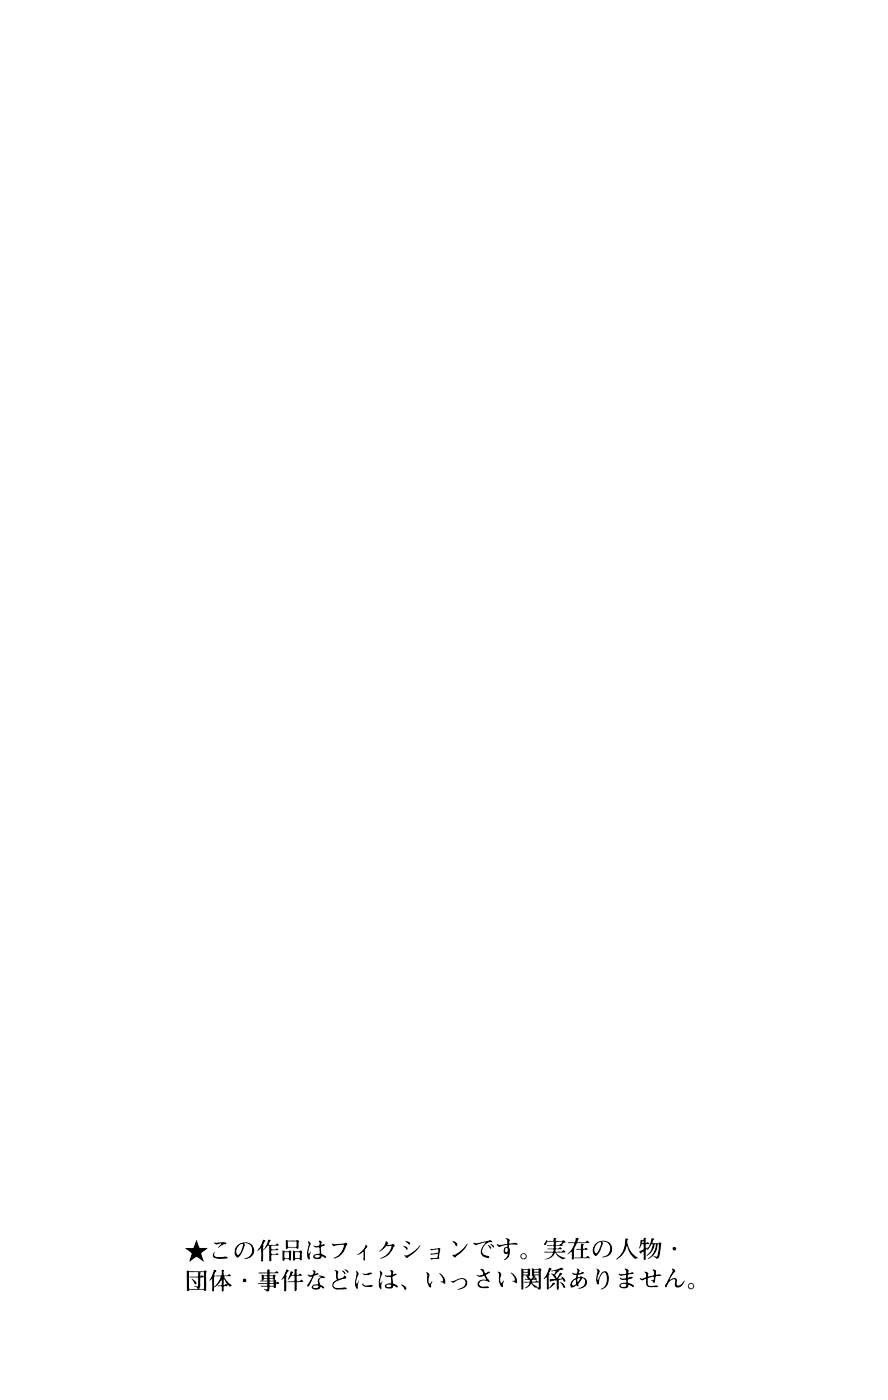 Манга Любовные неприятности / To Love-Ru  - Том 6 Глава 44 Страница 7